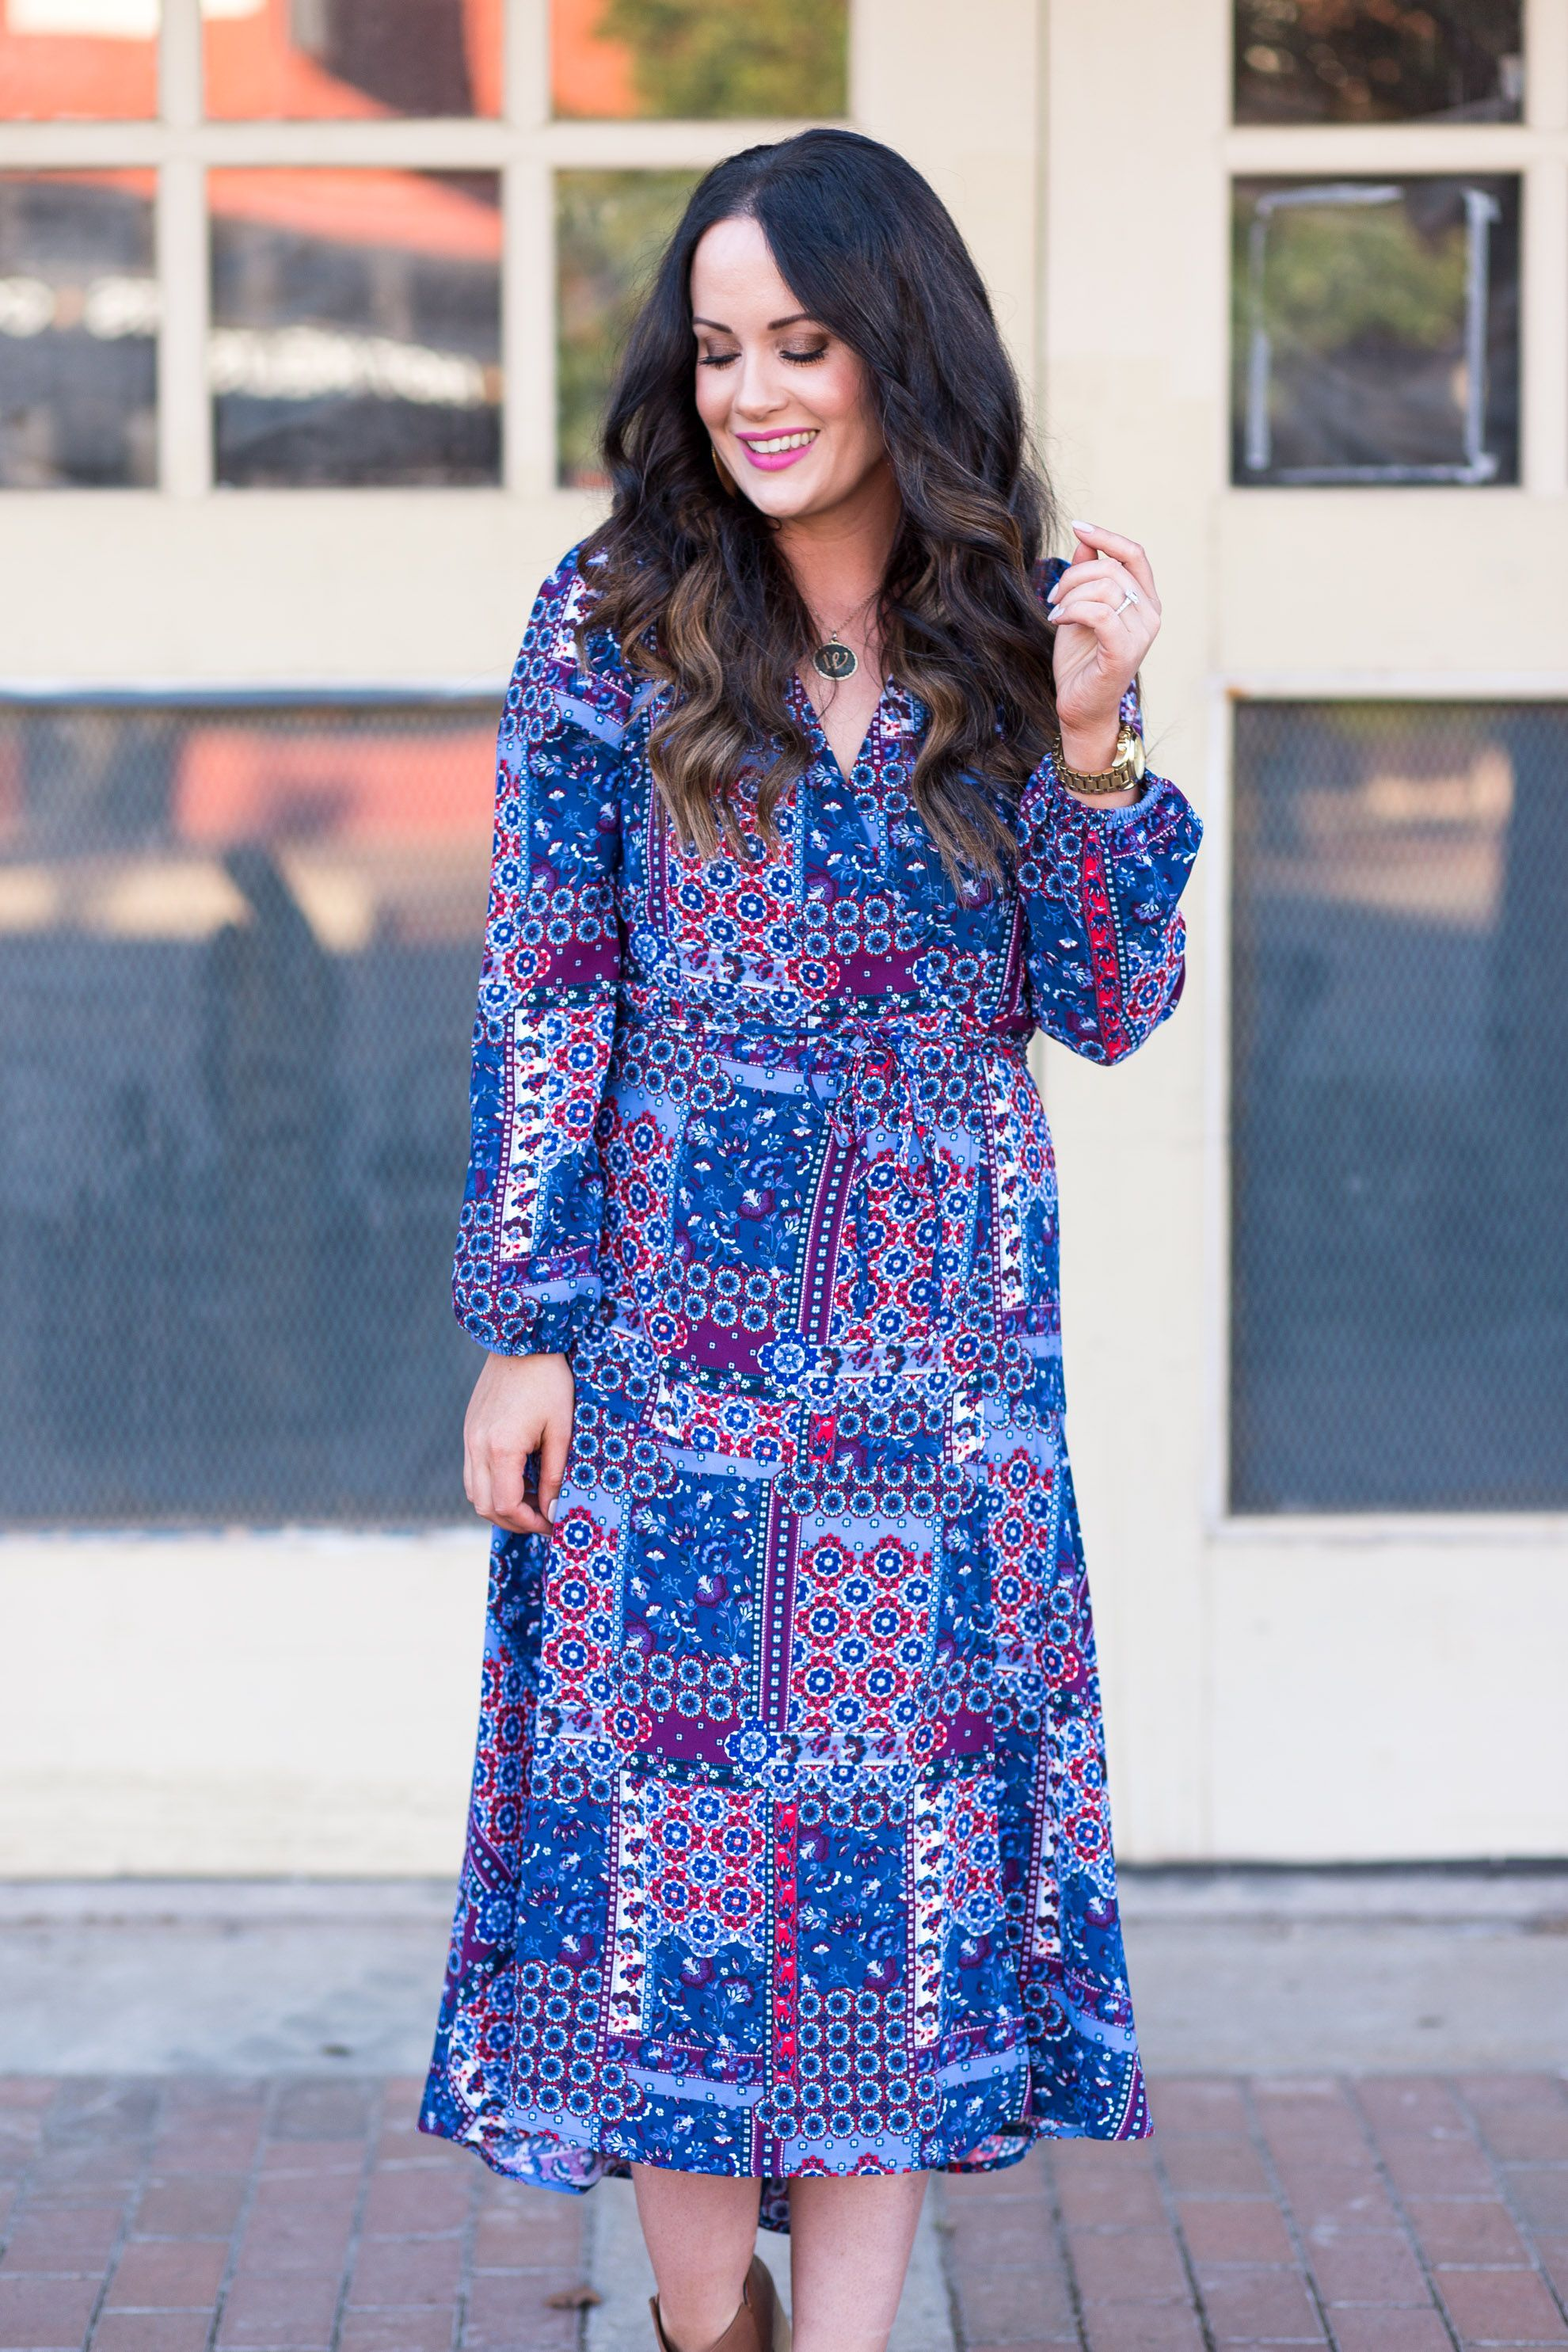 Scoop Fashion Now Available At Walmart The Double Take Girls Fashion Paisley Print Dress Fashion Now [ 2970 x 1980 Pixel ]